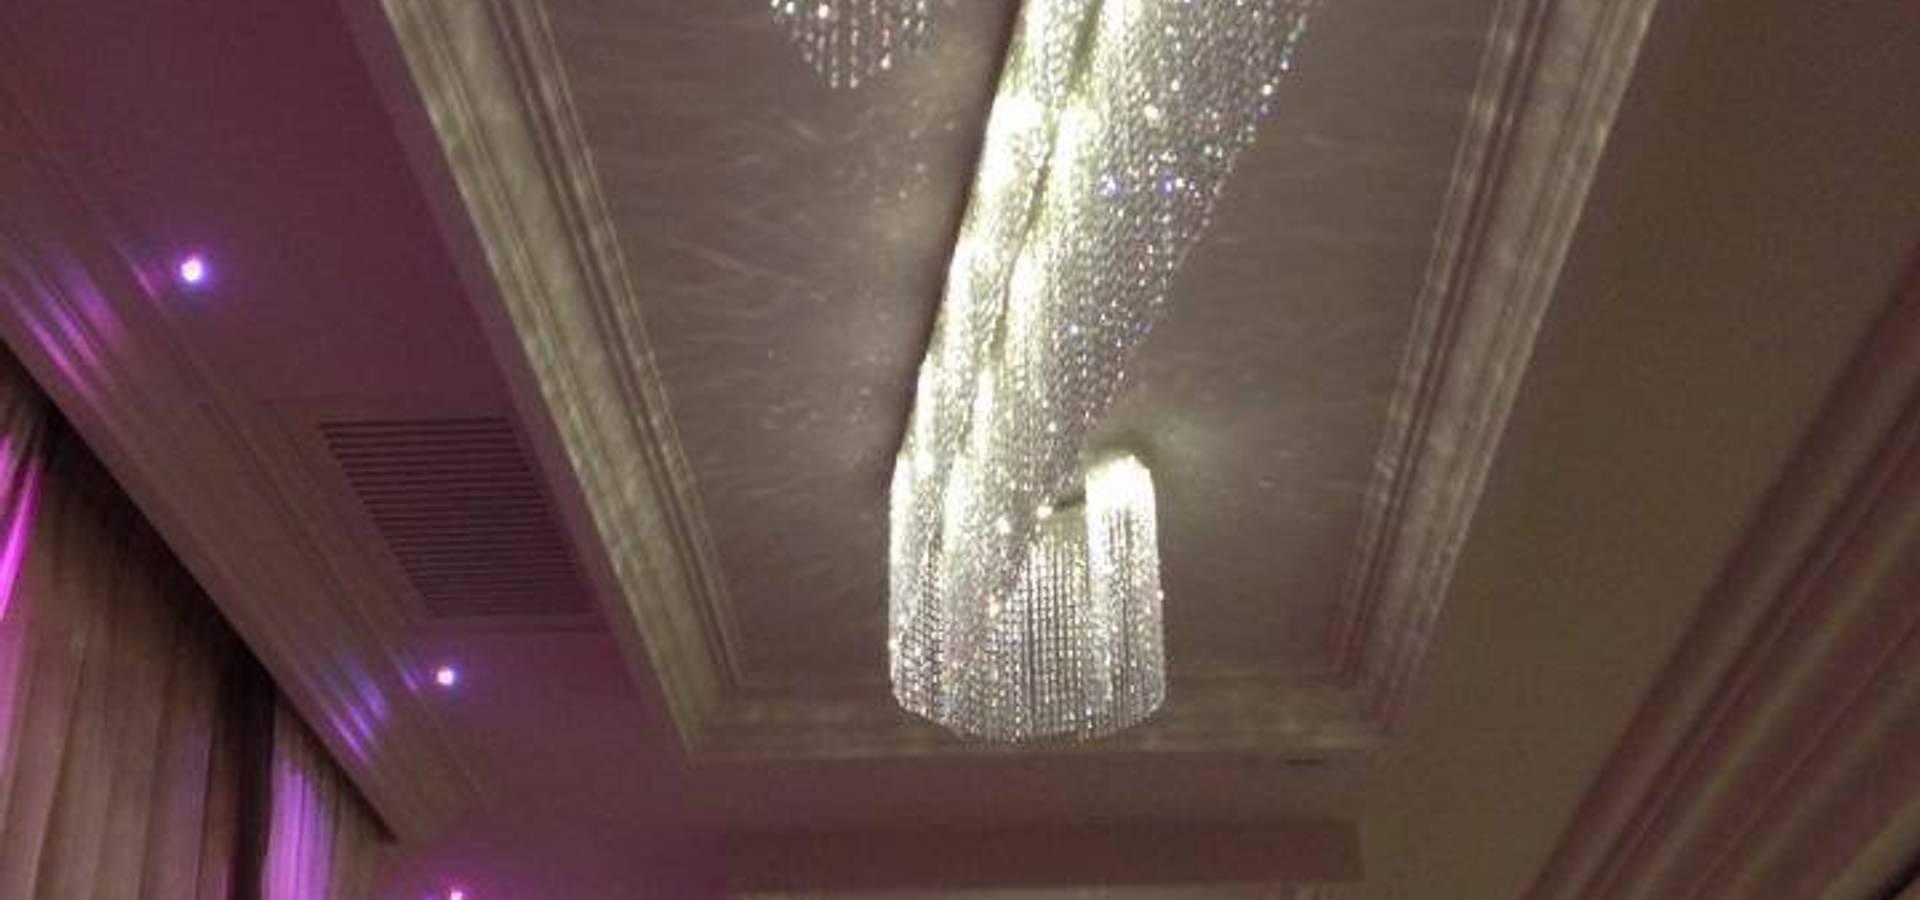 spinella illumina fabbrica lampadari